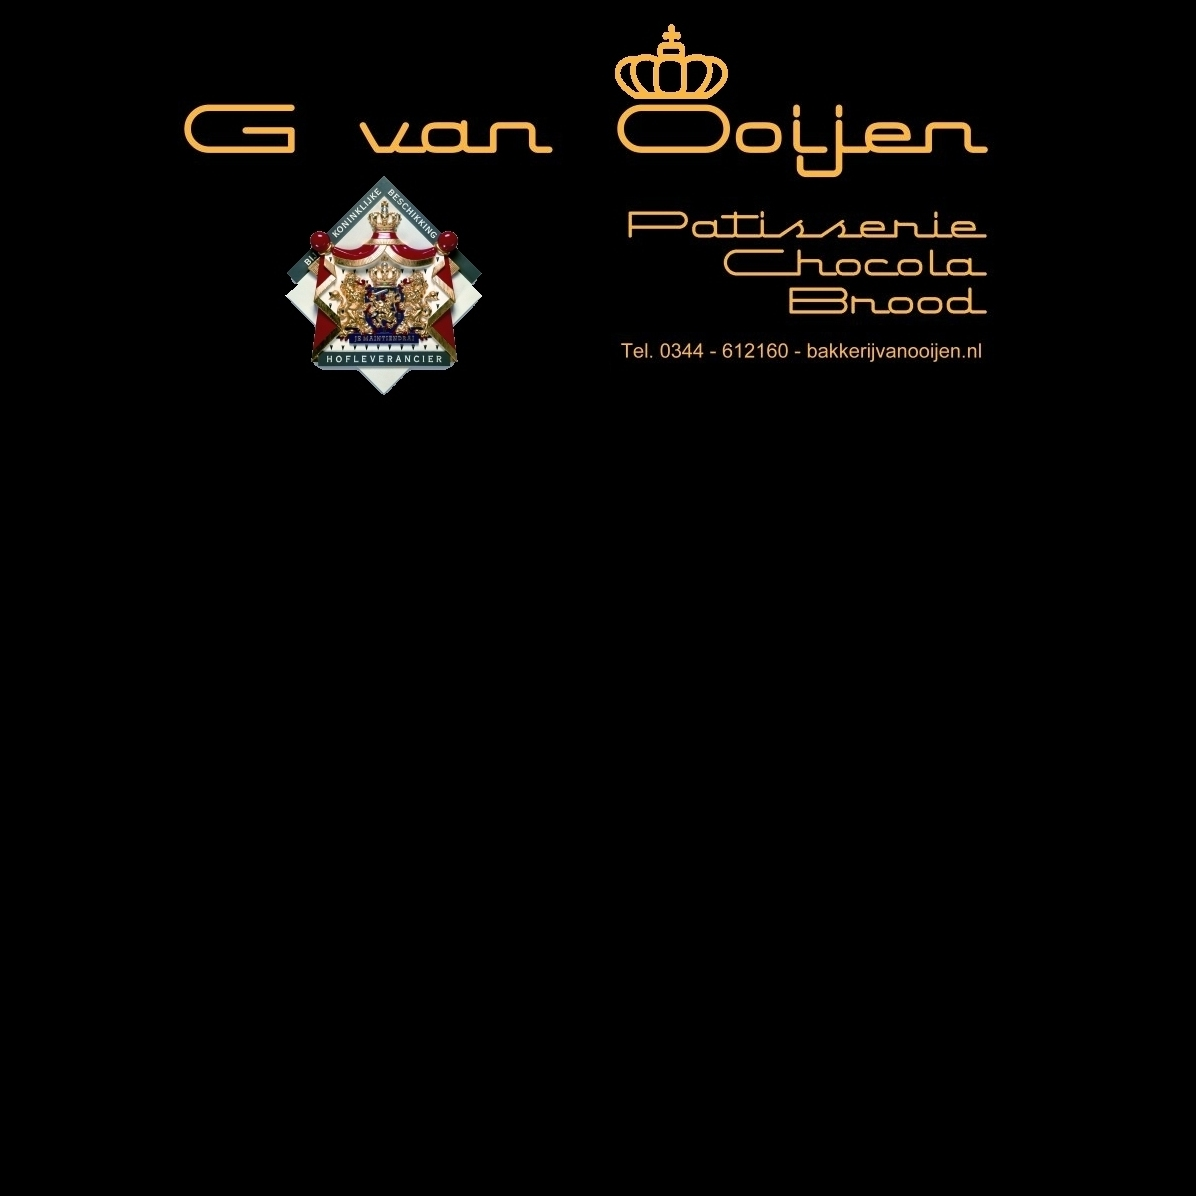 logo met kroon 2016vierkant boven